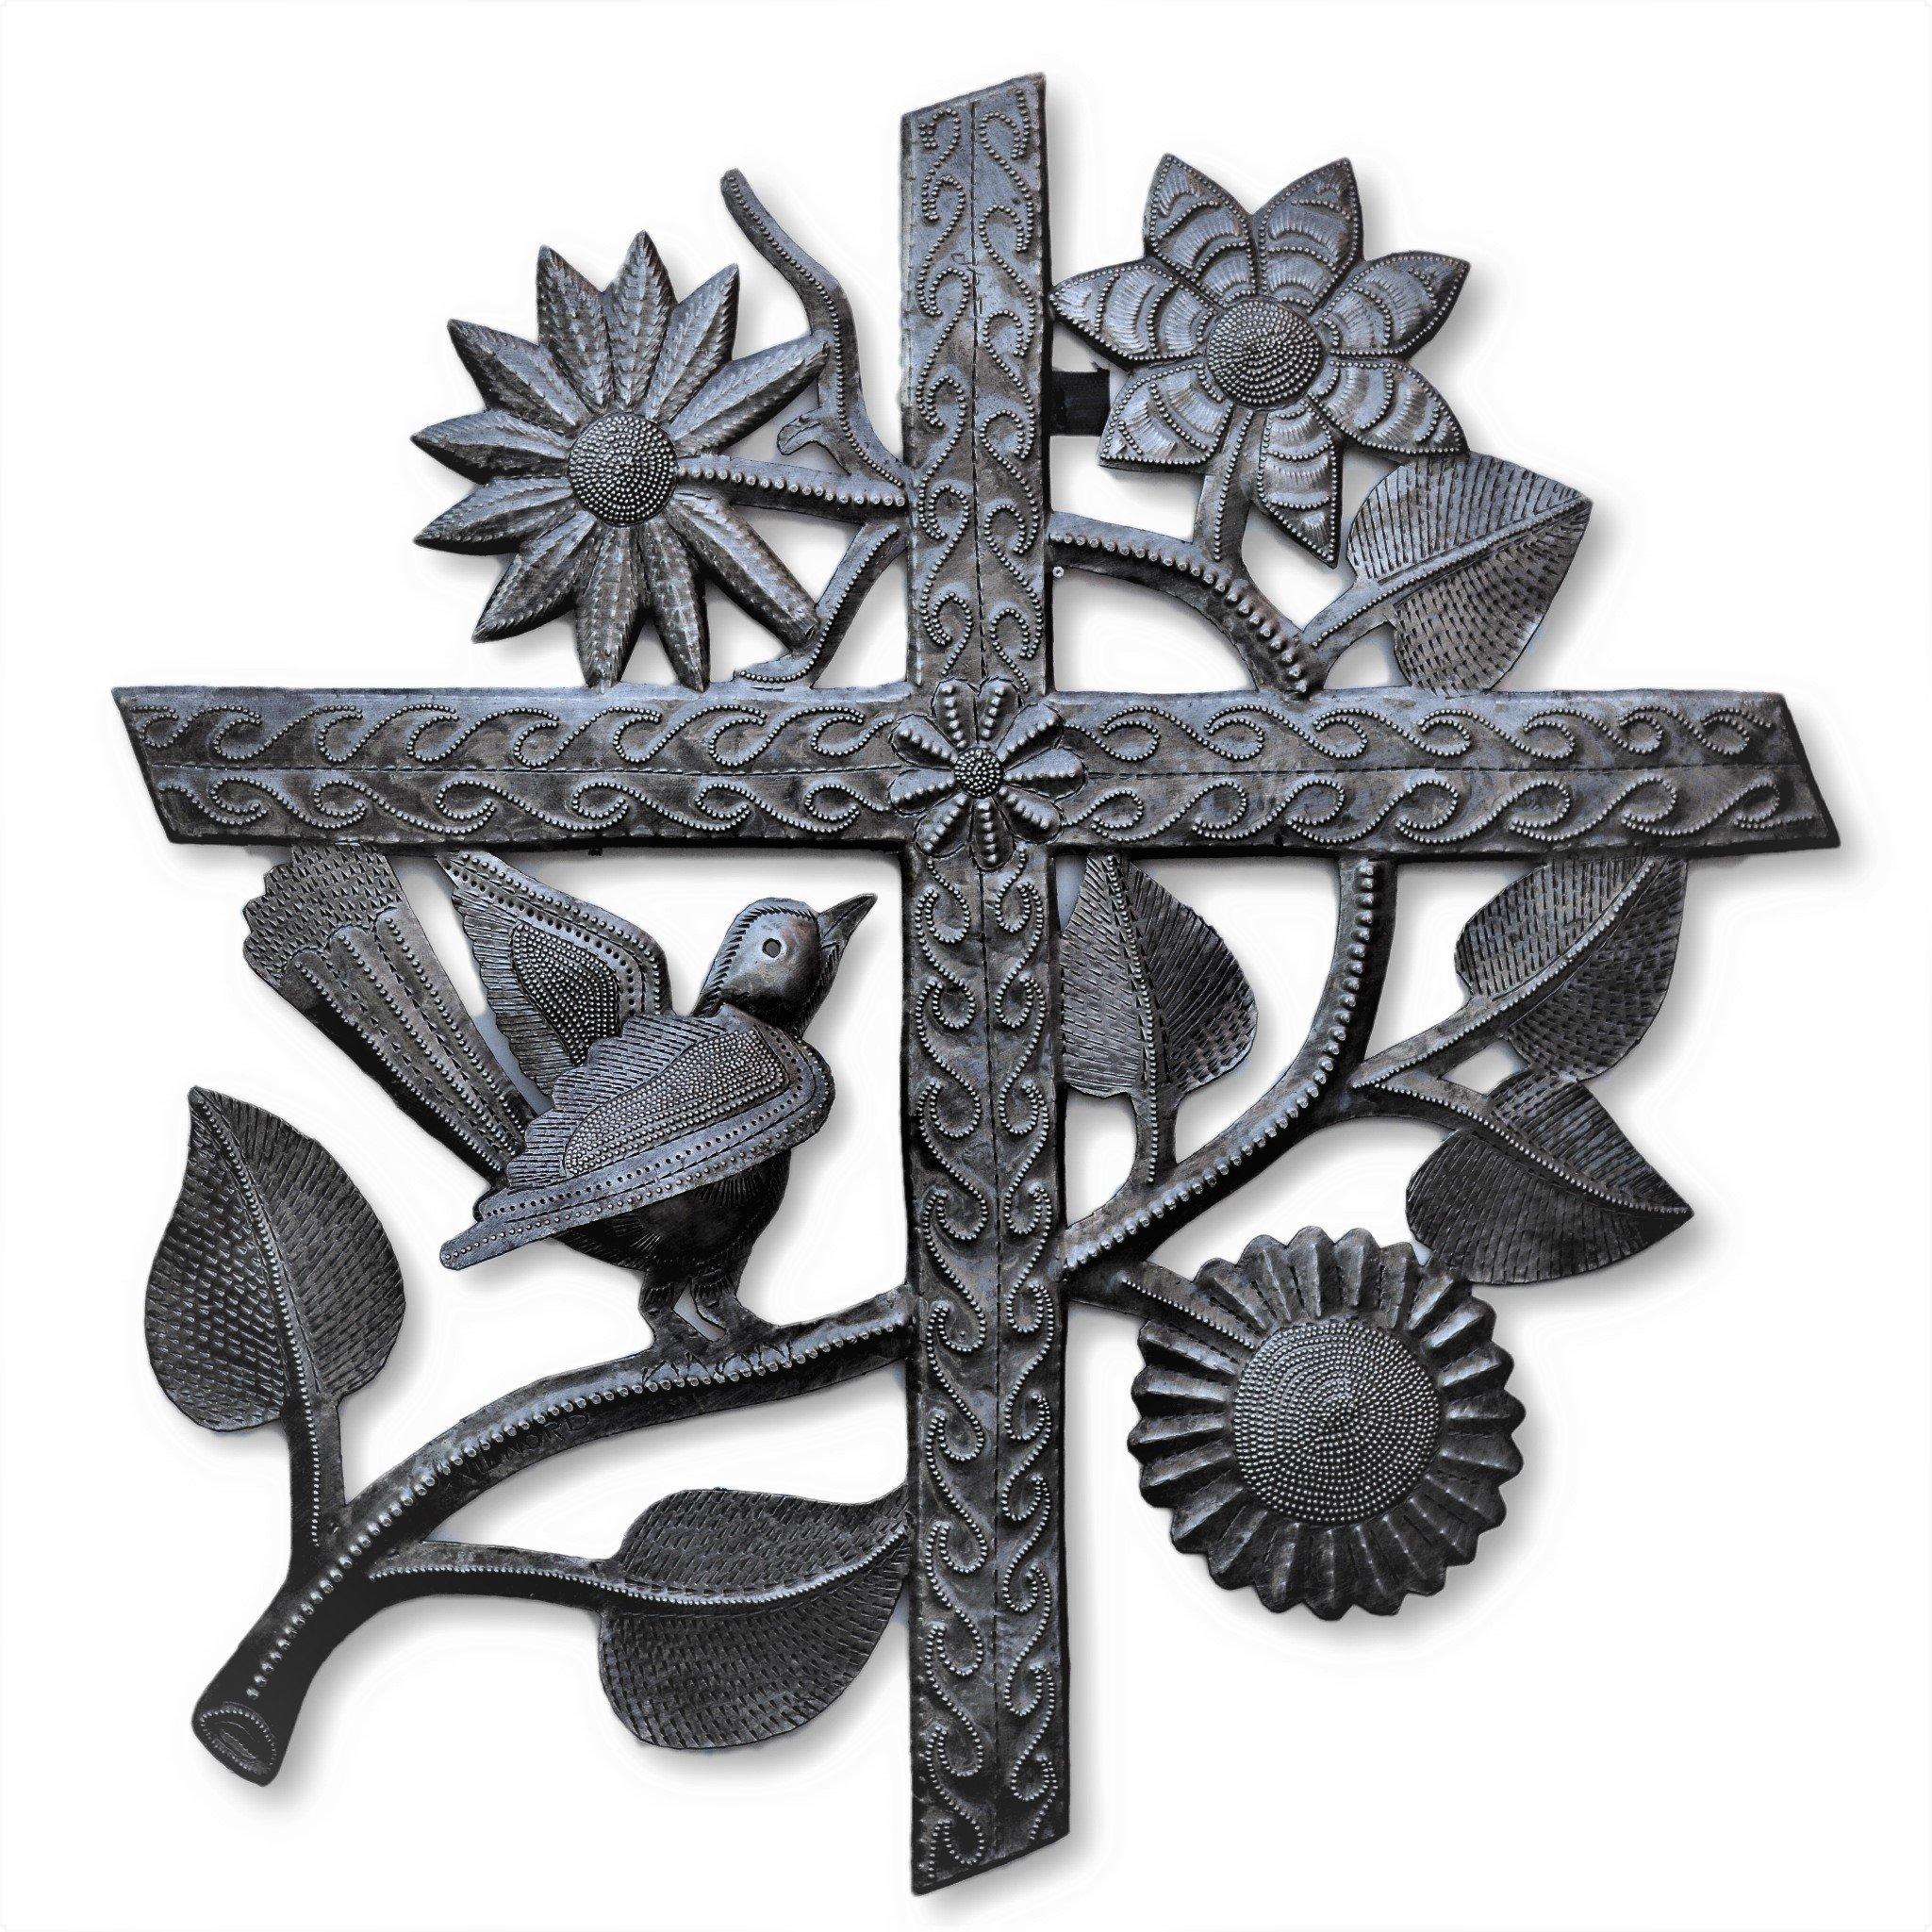 it's cactus - metal art haiti Cross, Metal Wall Art, Handmade in Haiti, Indoor and Outdoor Decor 16'' x 17''